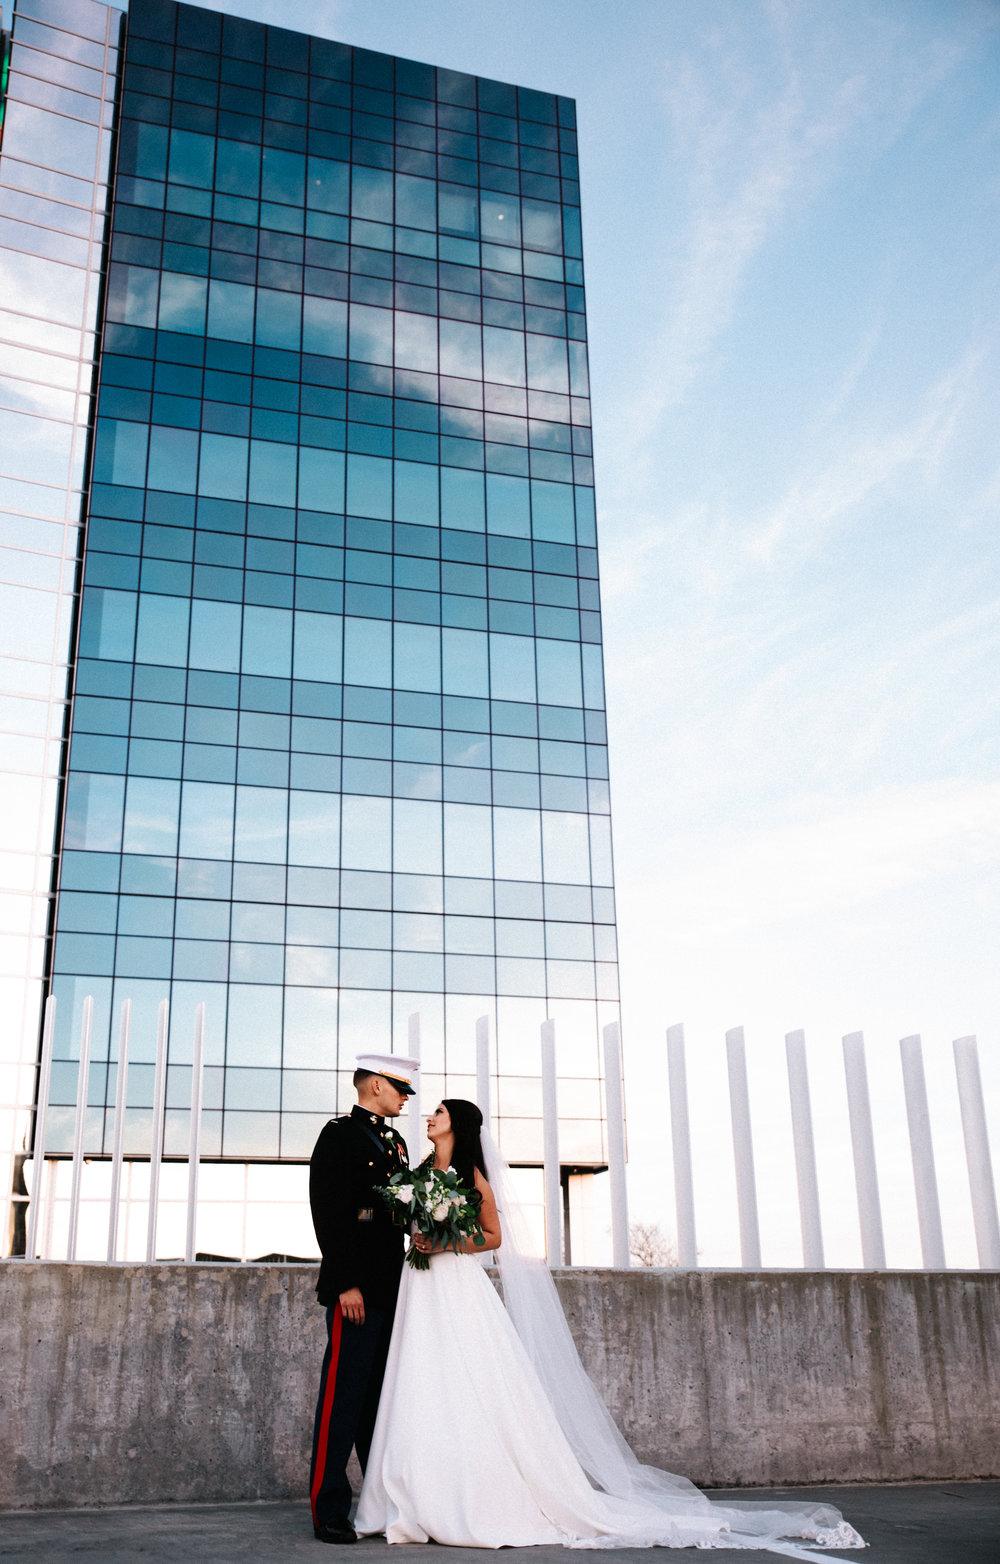 +Raleigh Wedding +North Carolina +Photographer +Wedding Photographer +Engagement Photographer +All Saints Chapel-6946.jpg